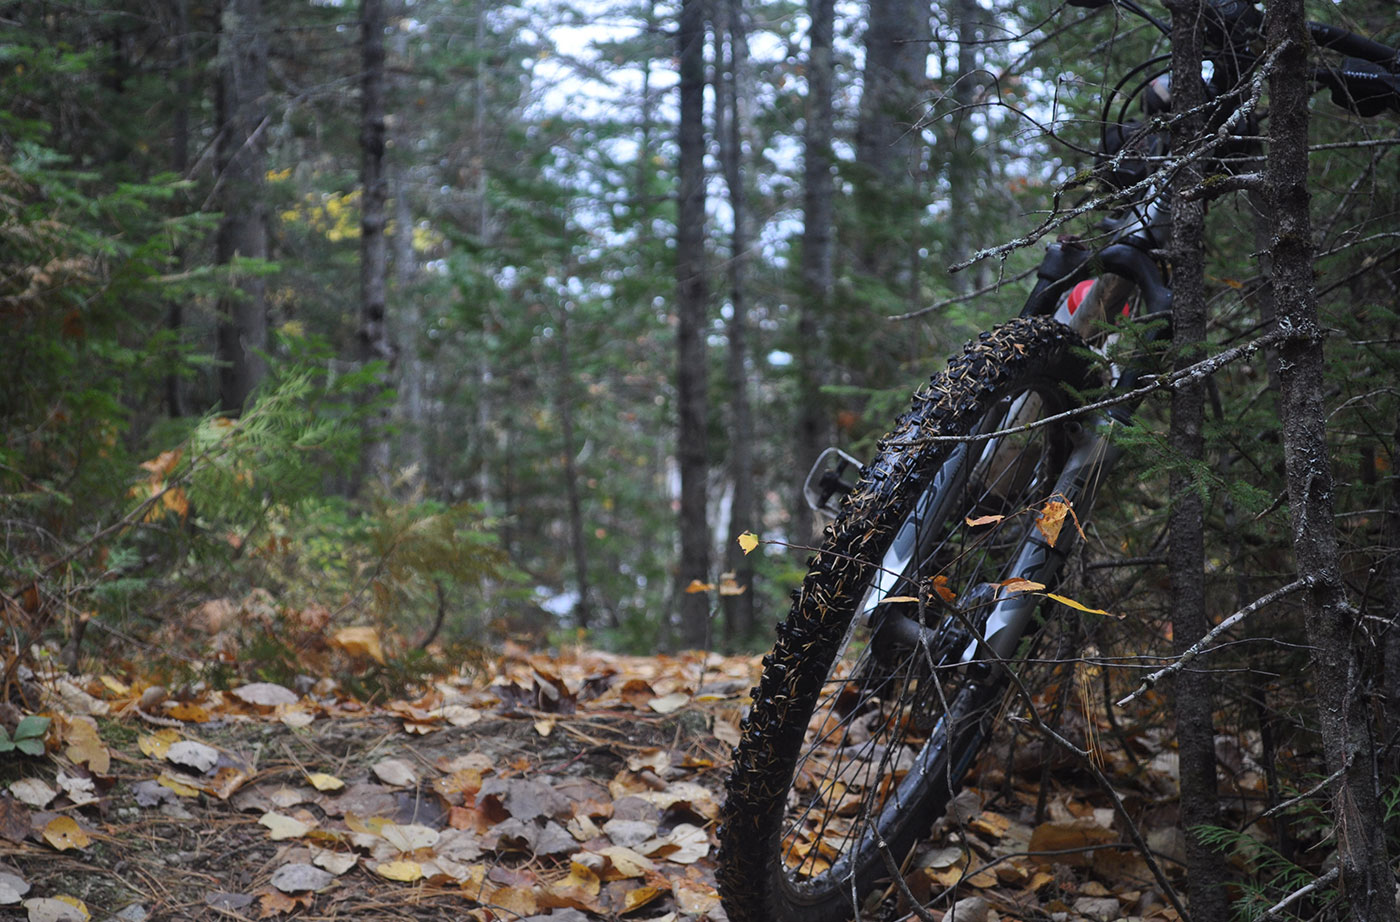 mountain bike on wooded path